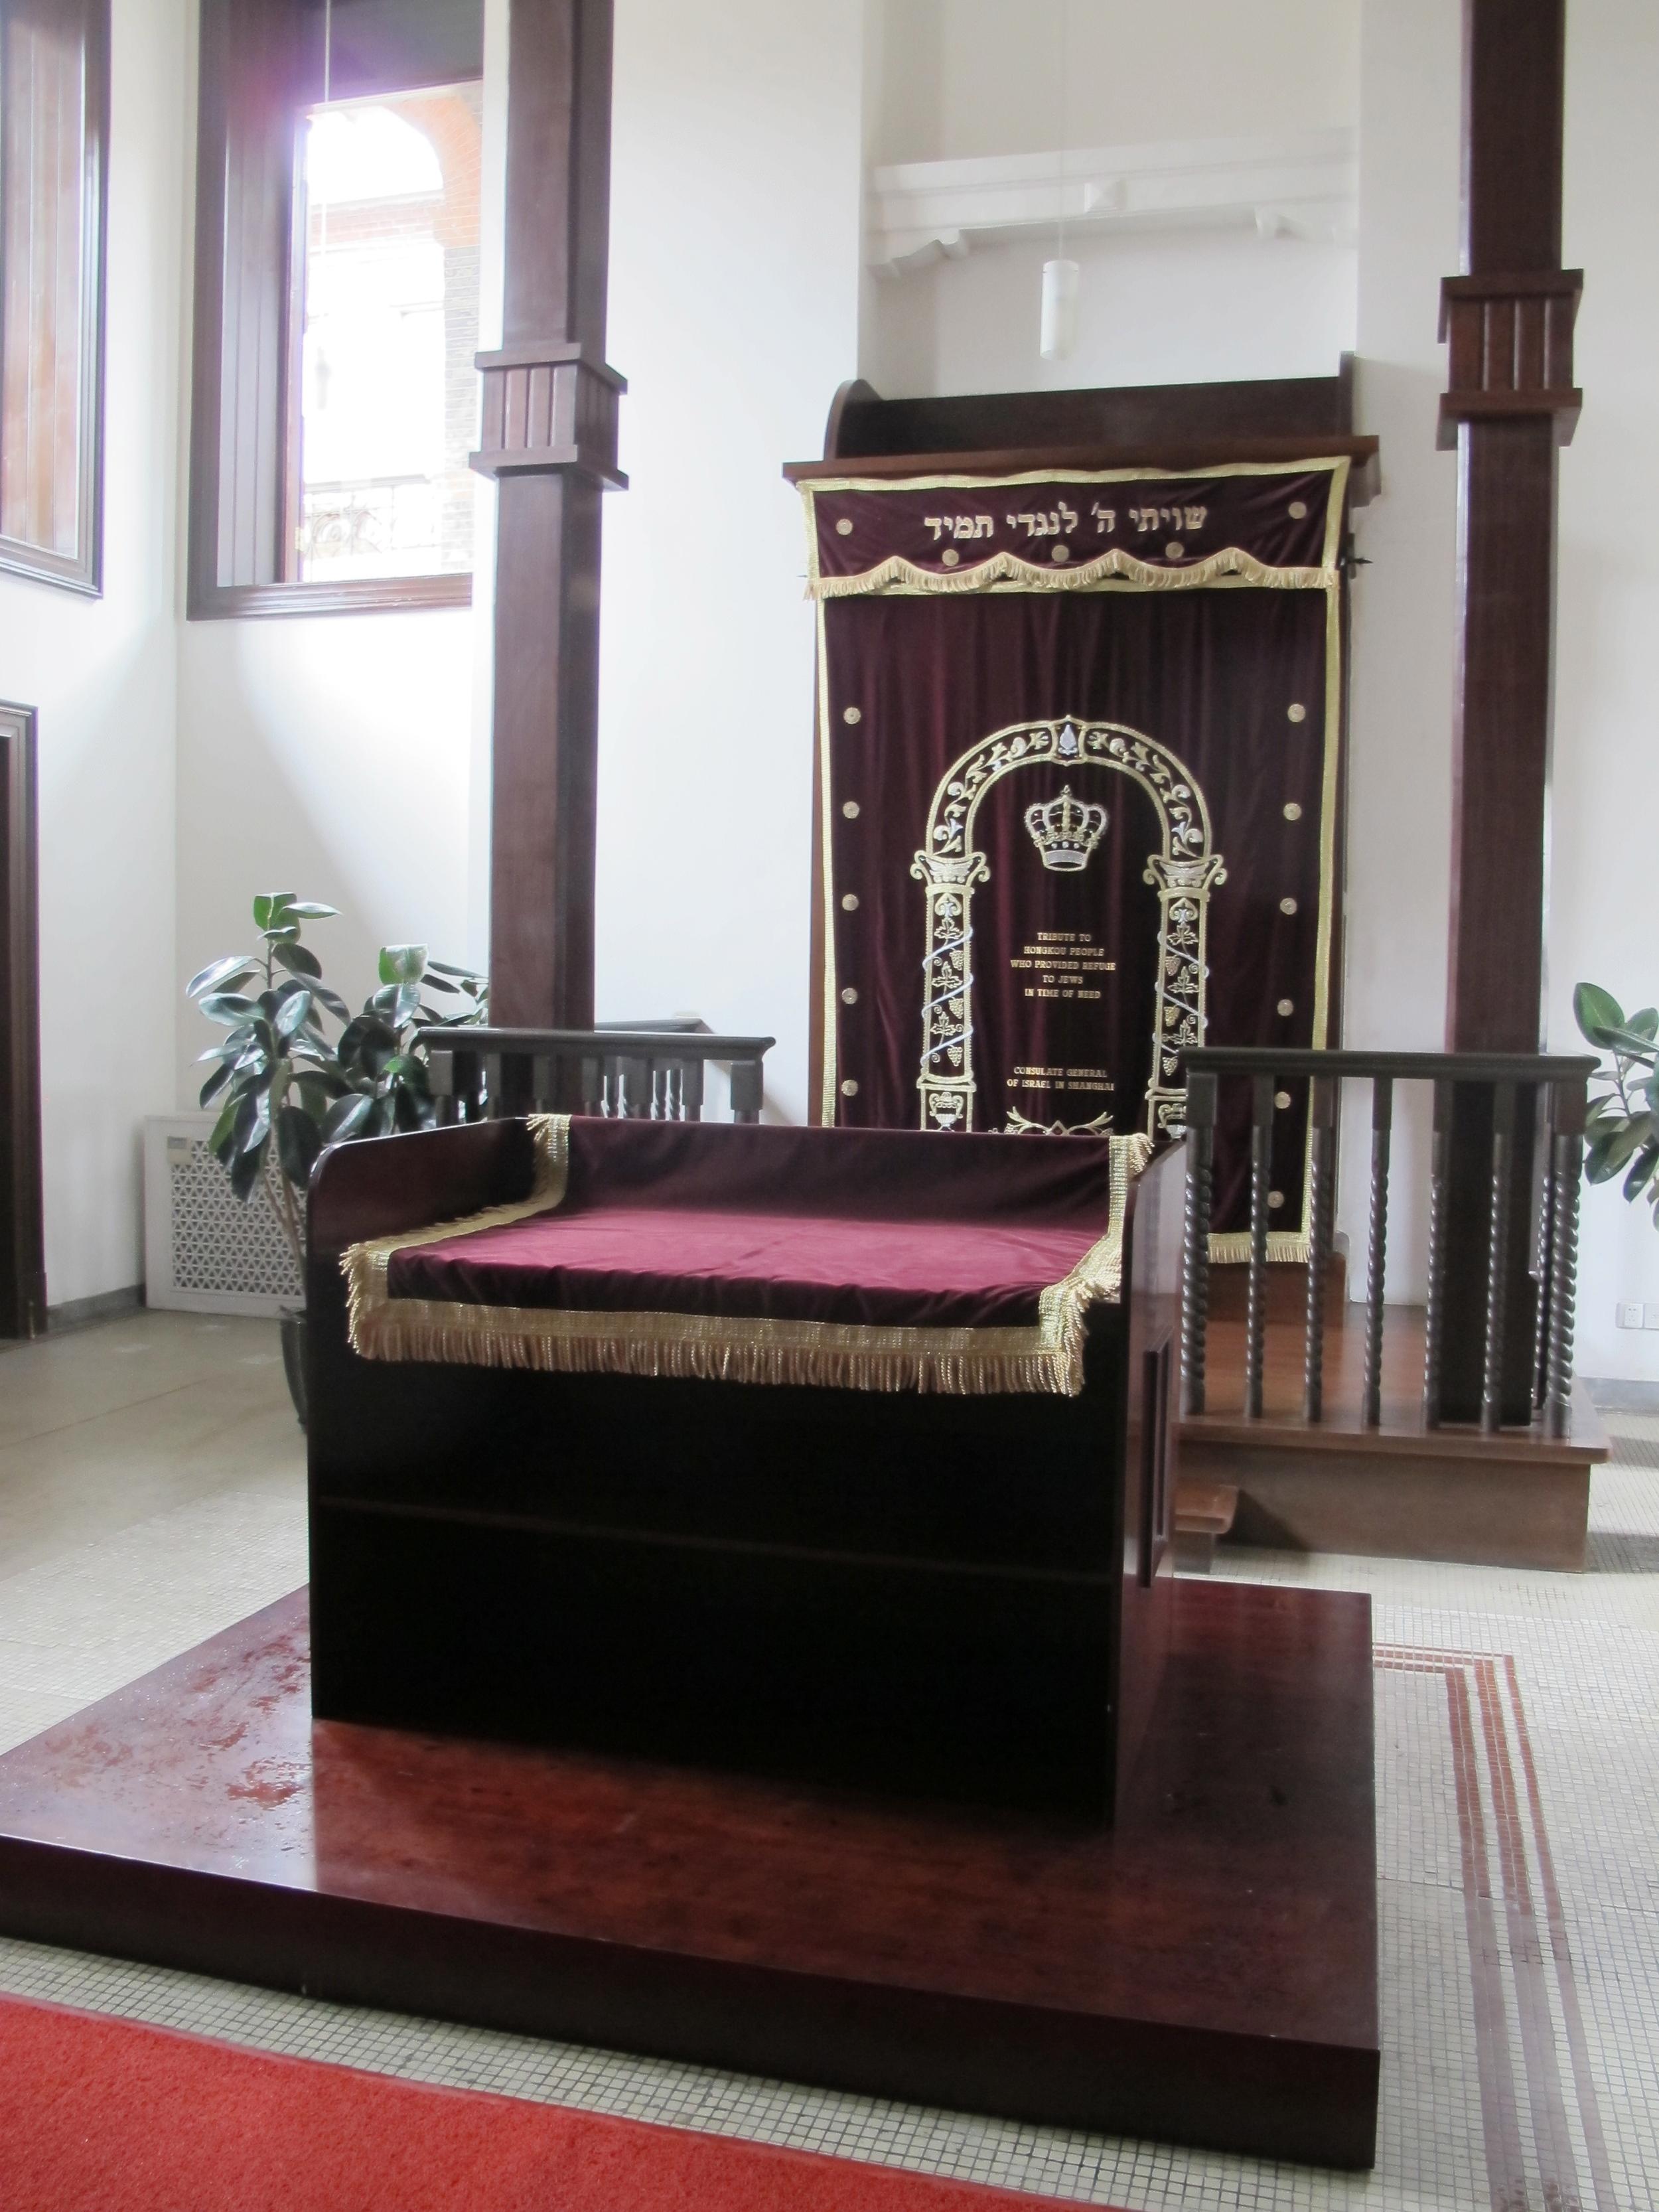 1st Floor Restored Synagogue